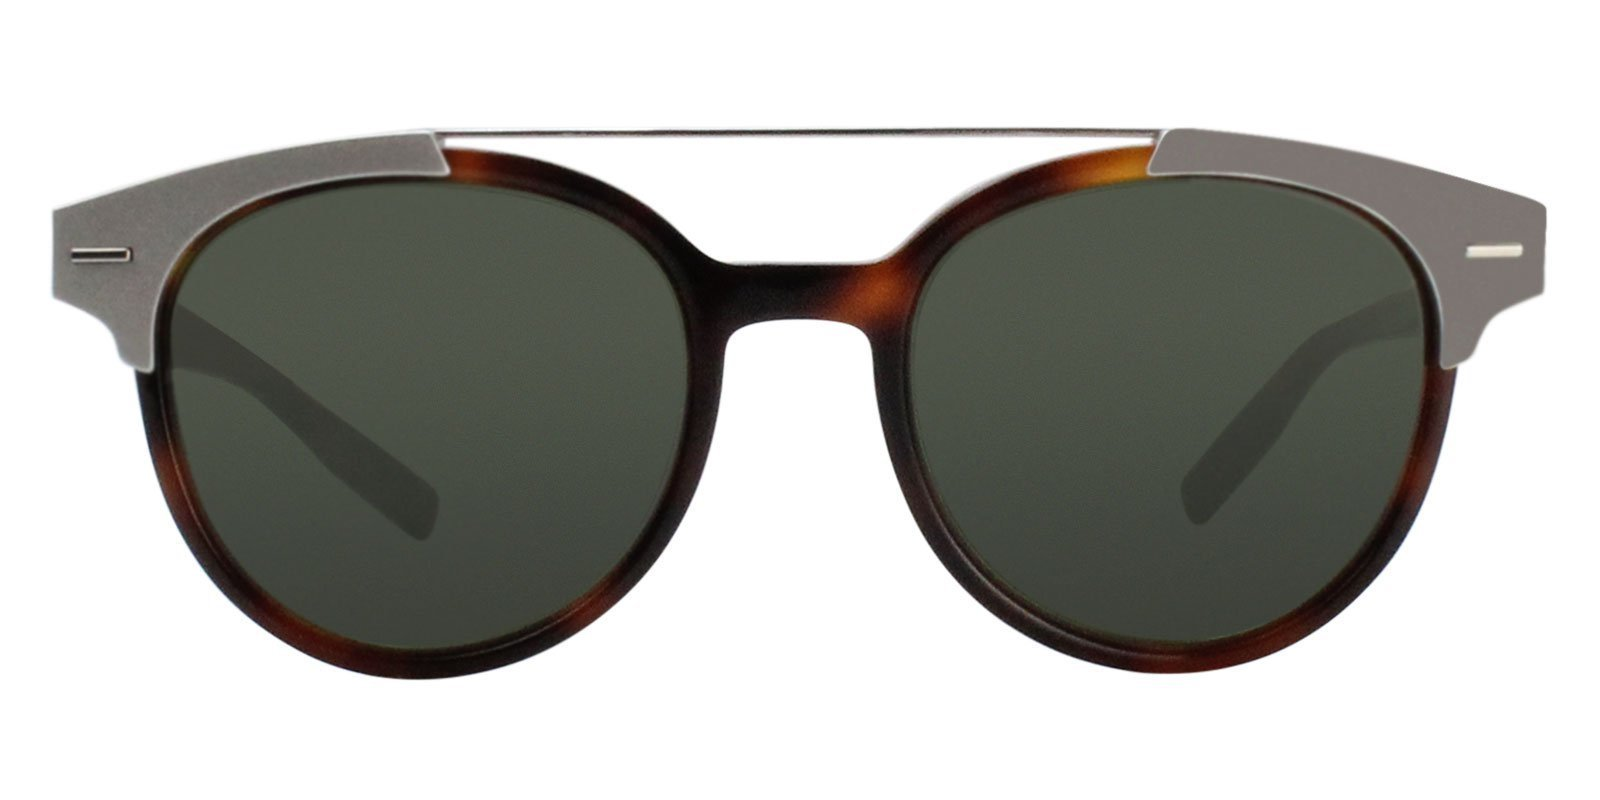 a6c39e72e5 Dior Homme - Black Tie 2.0SJ Tortoise - Green sunglasses